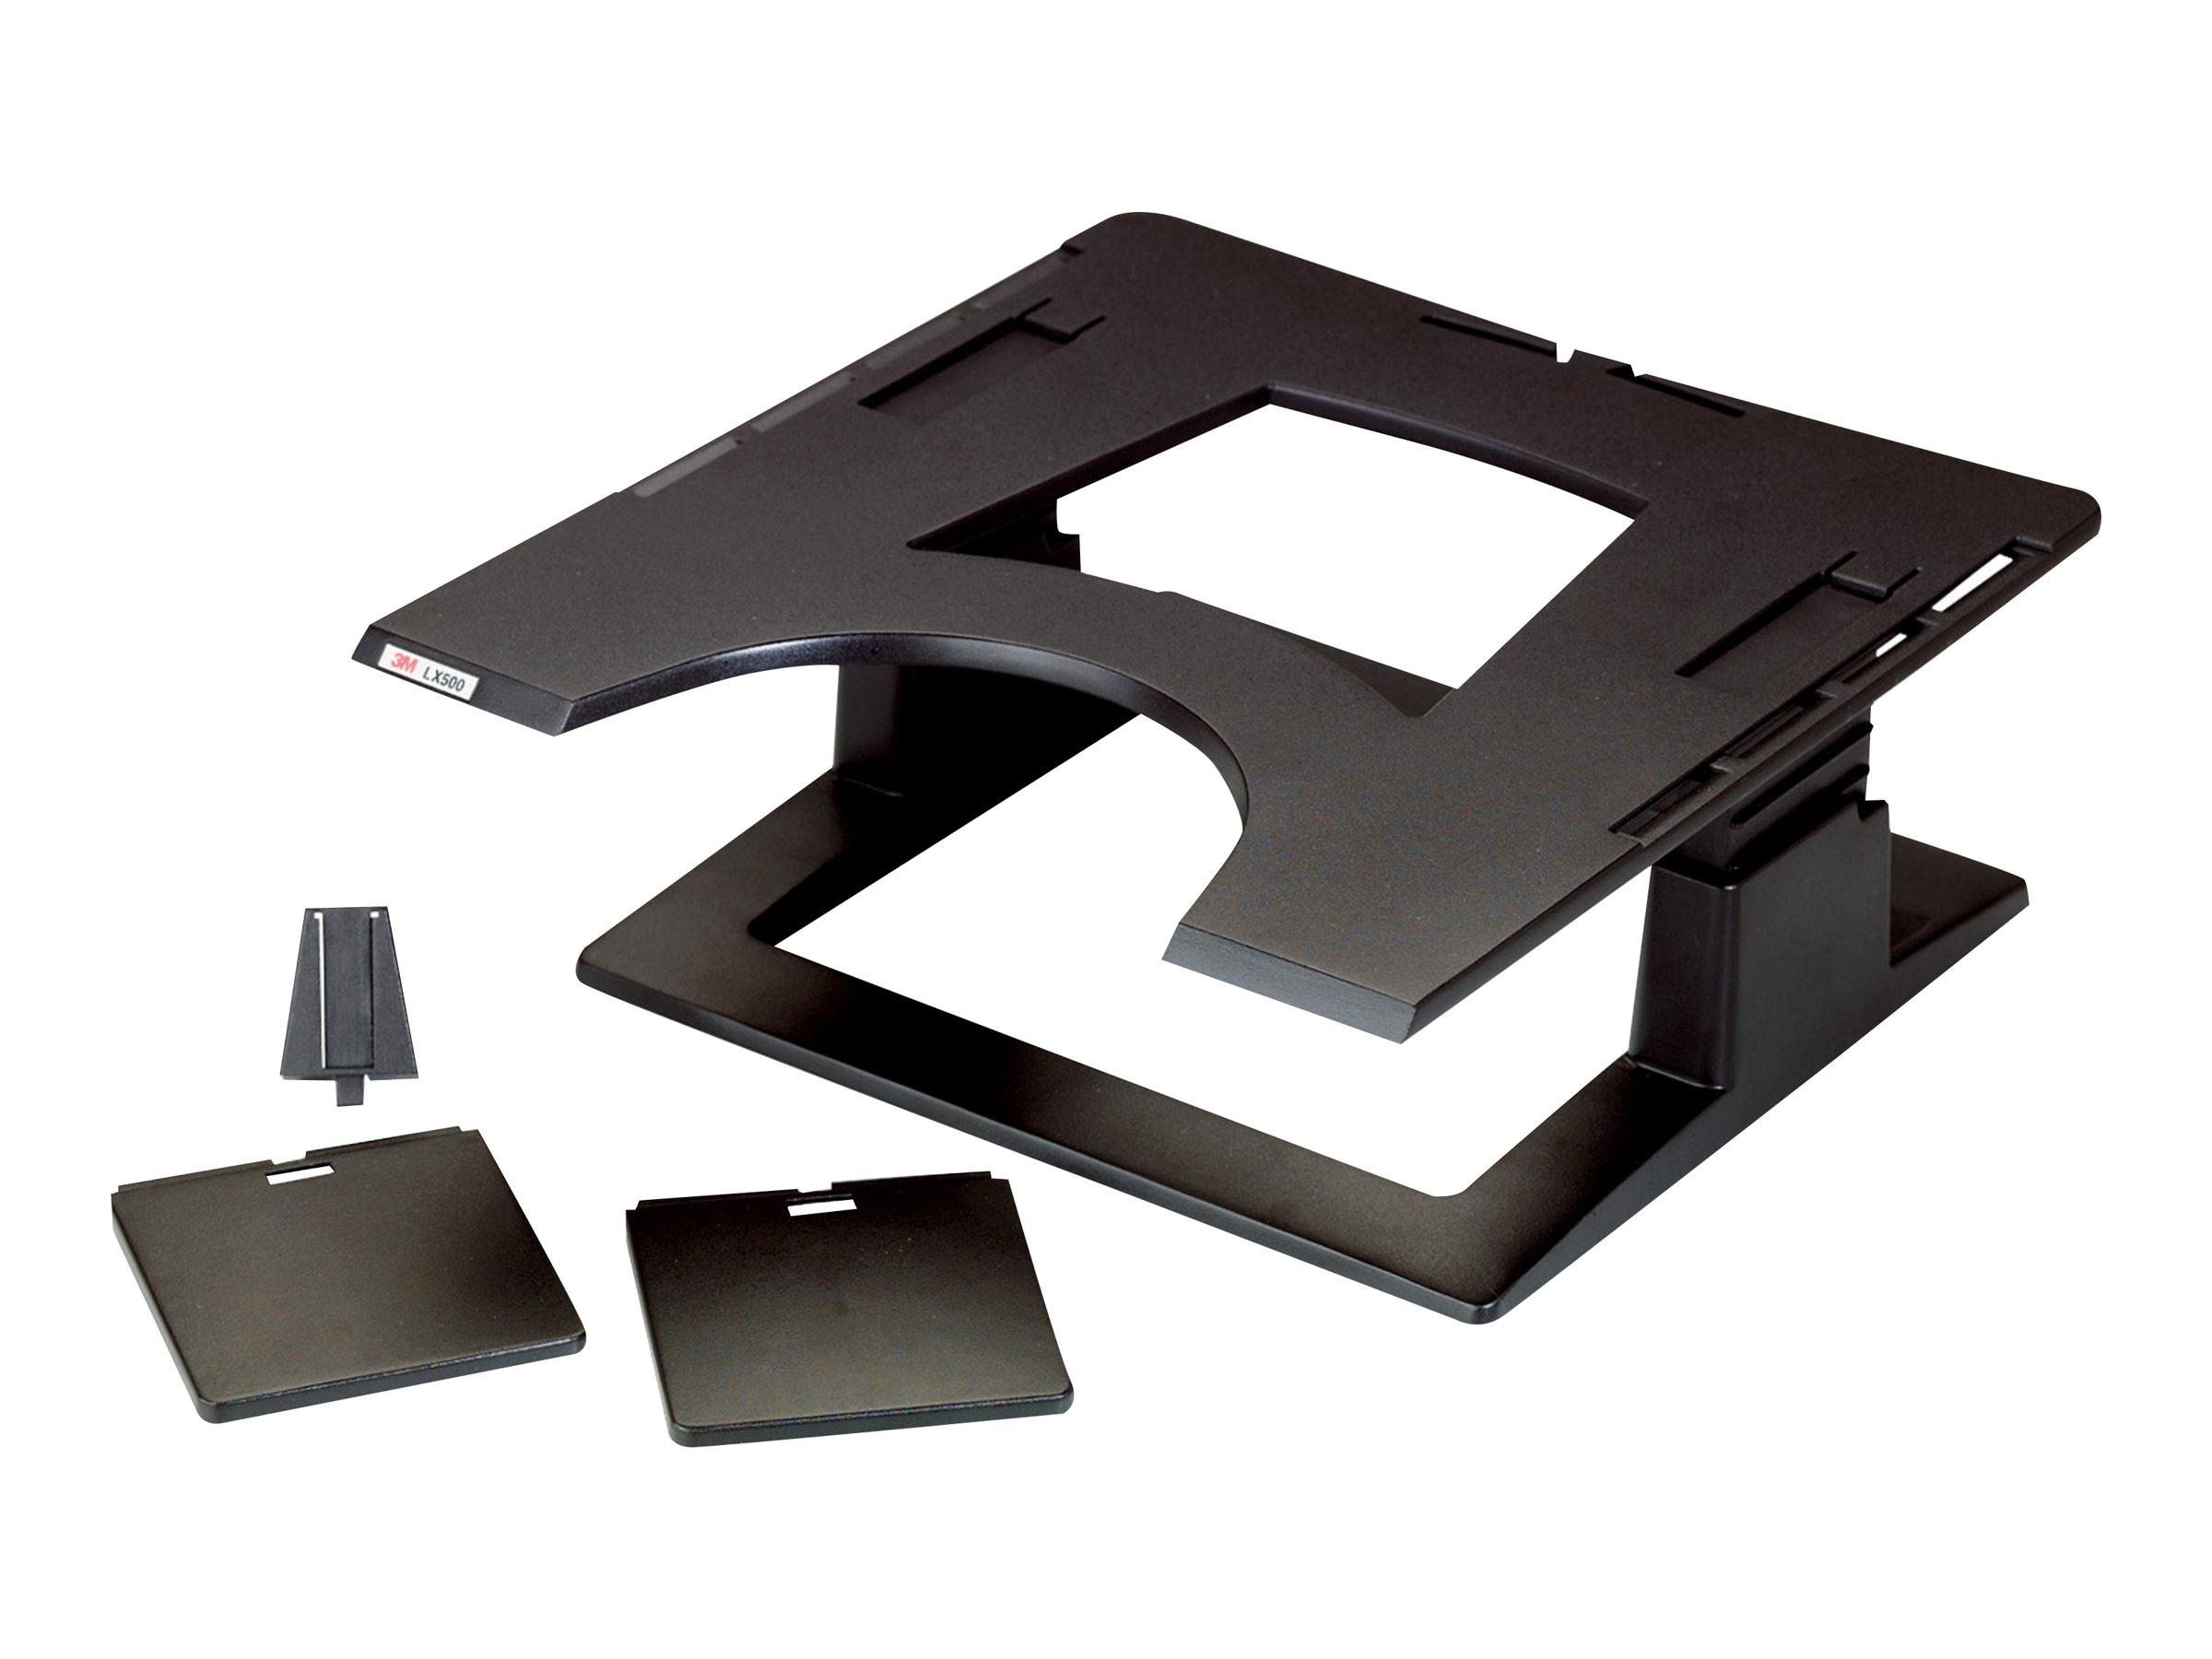 3M Adjustable Notebook Riser LX500 - Notebook-Plattform - Schwarz